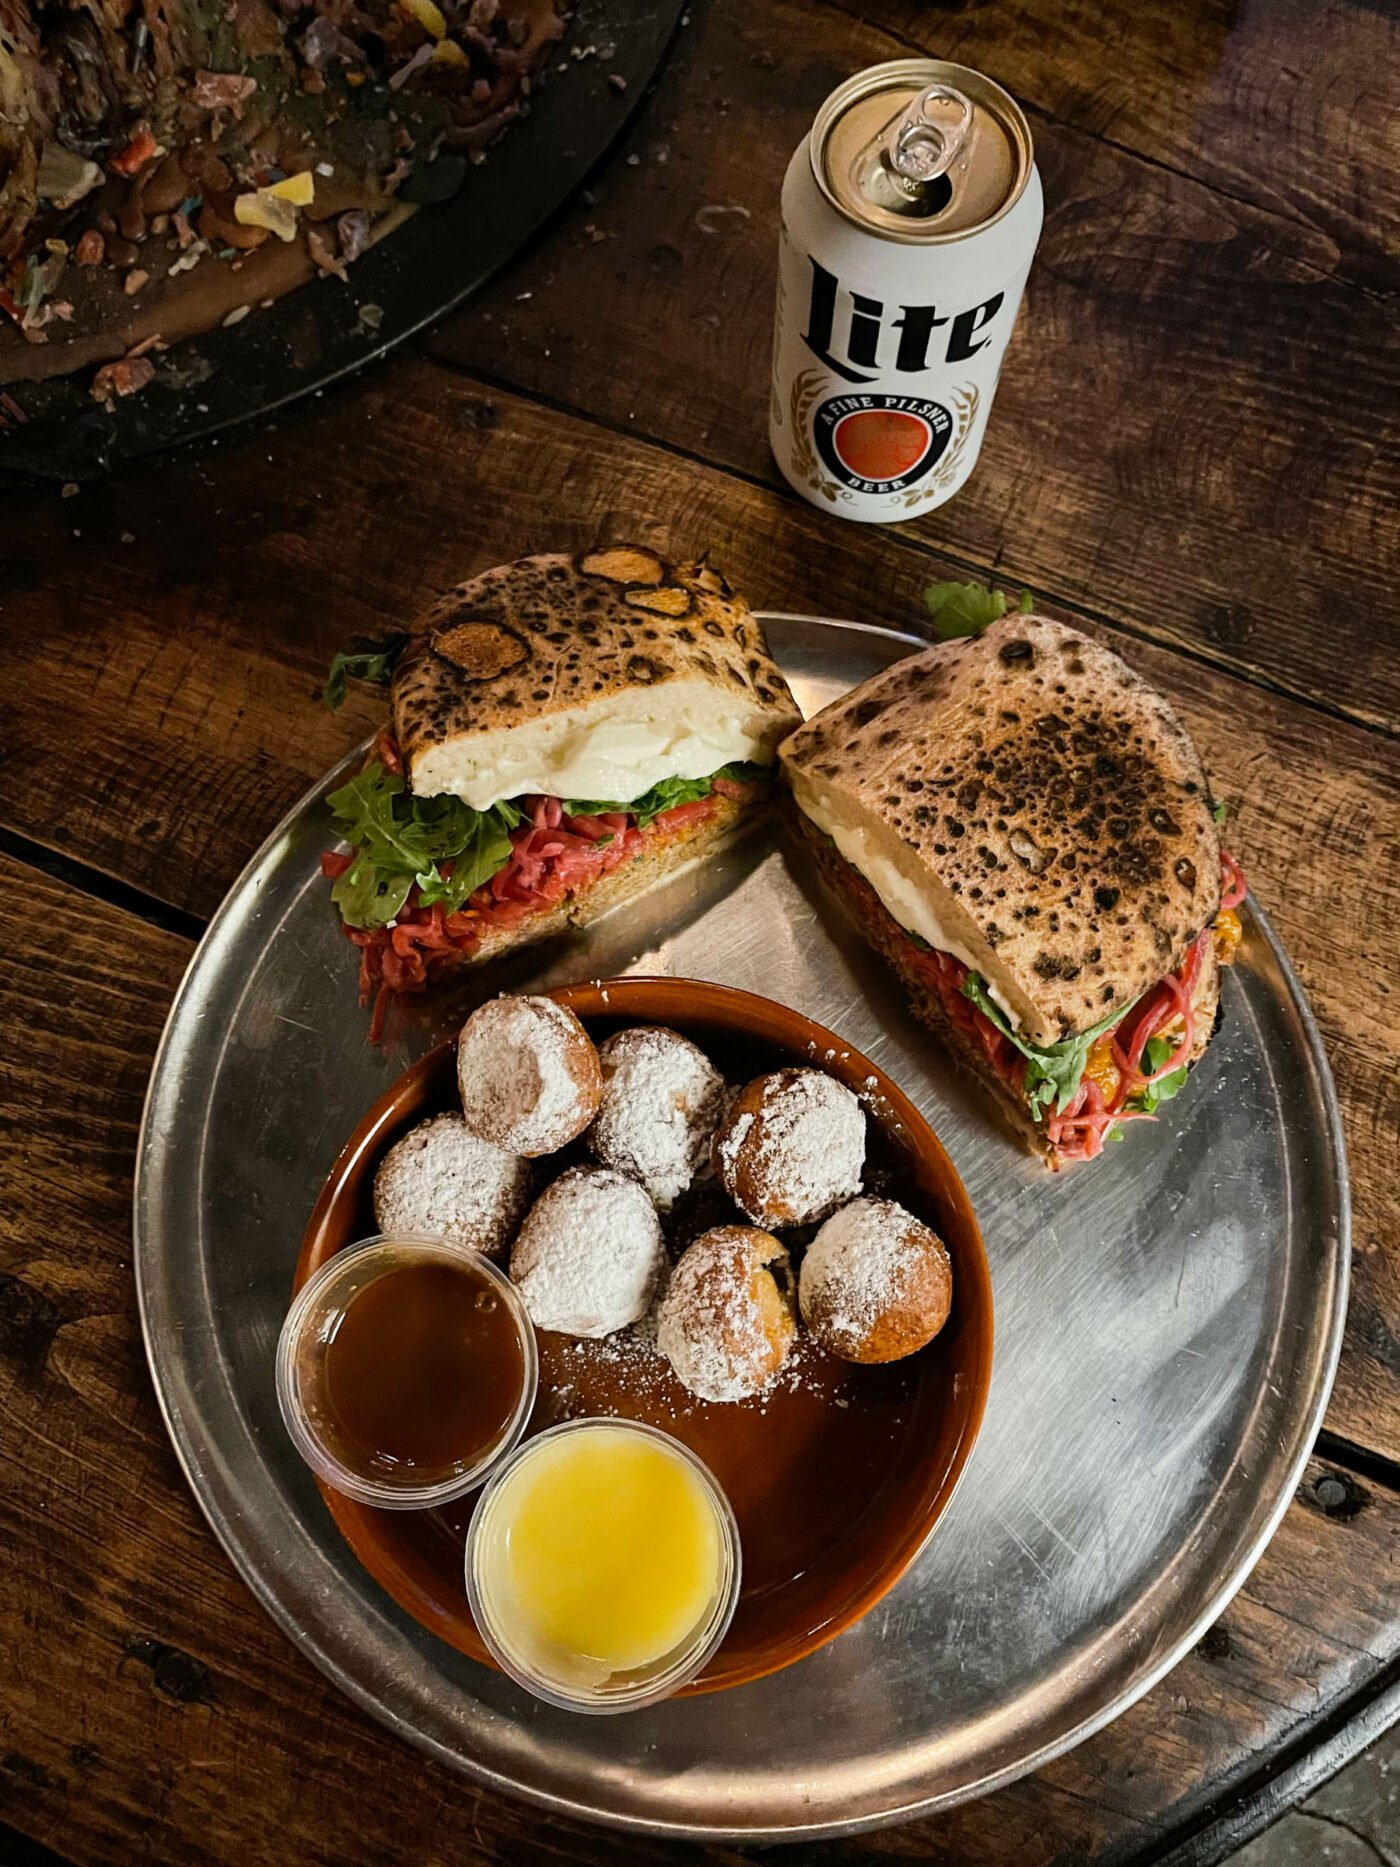 miller lite and sandwich